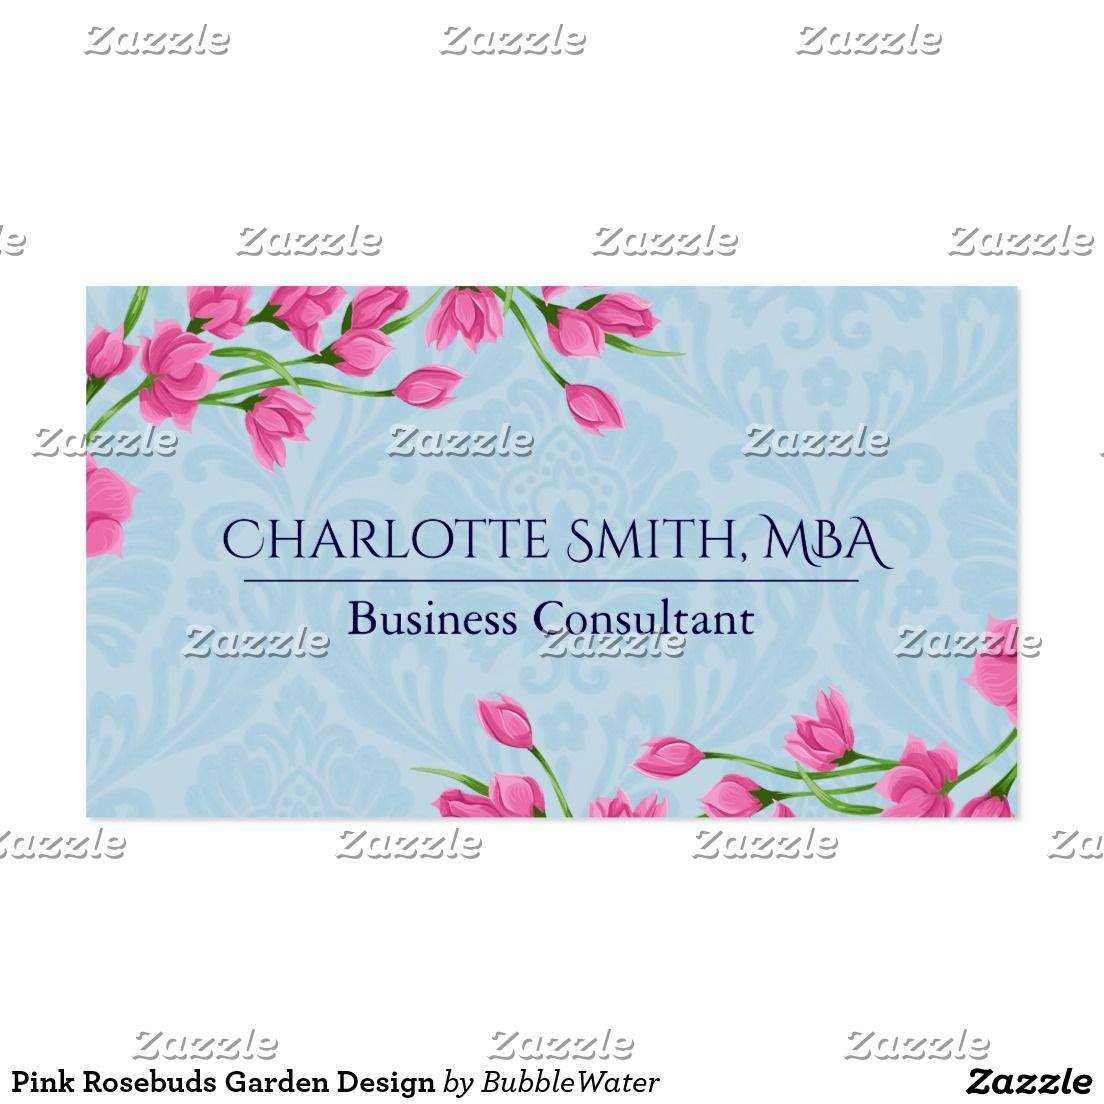 Pink Rosebuds Garden Design Business Card | Business cards, Business ...